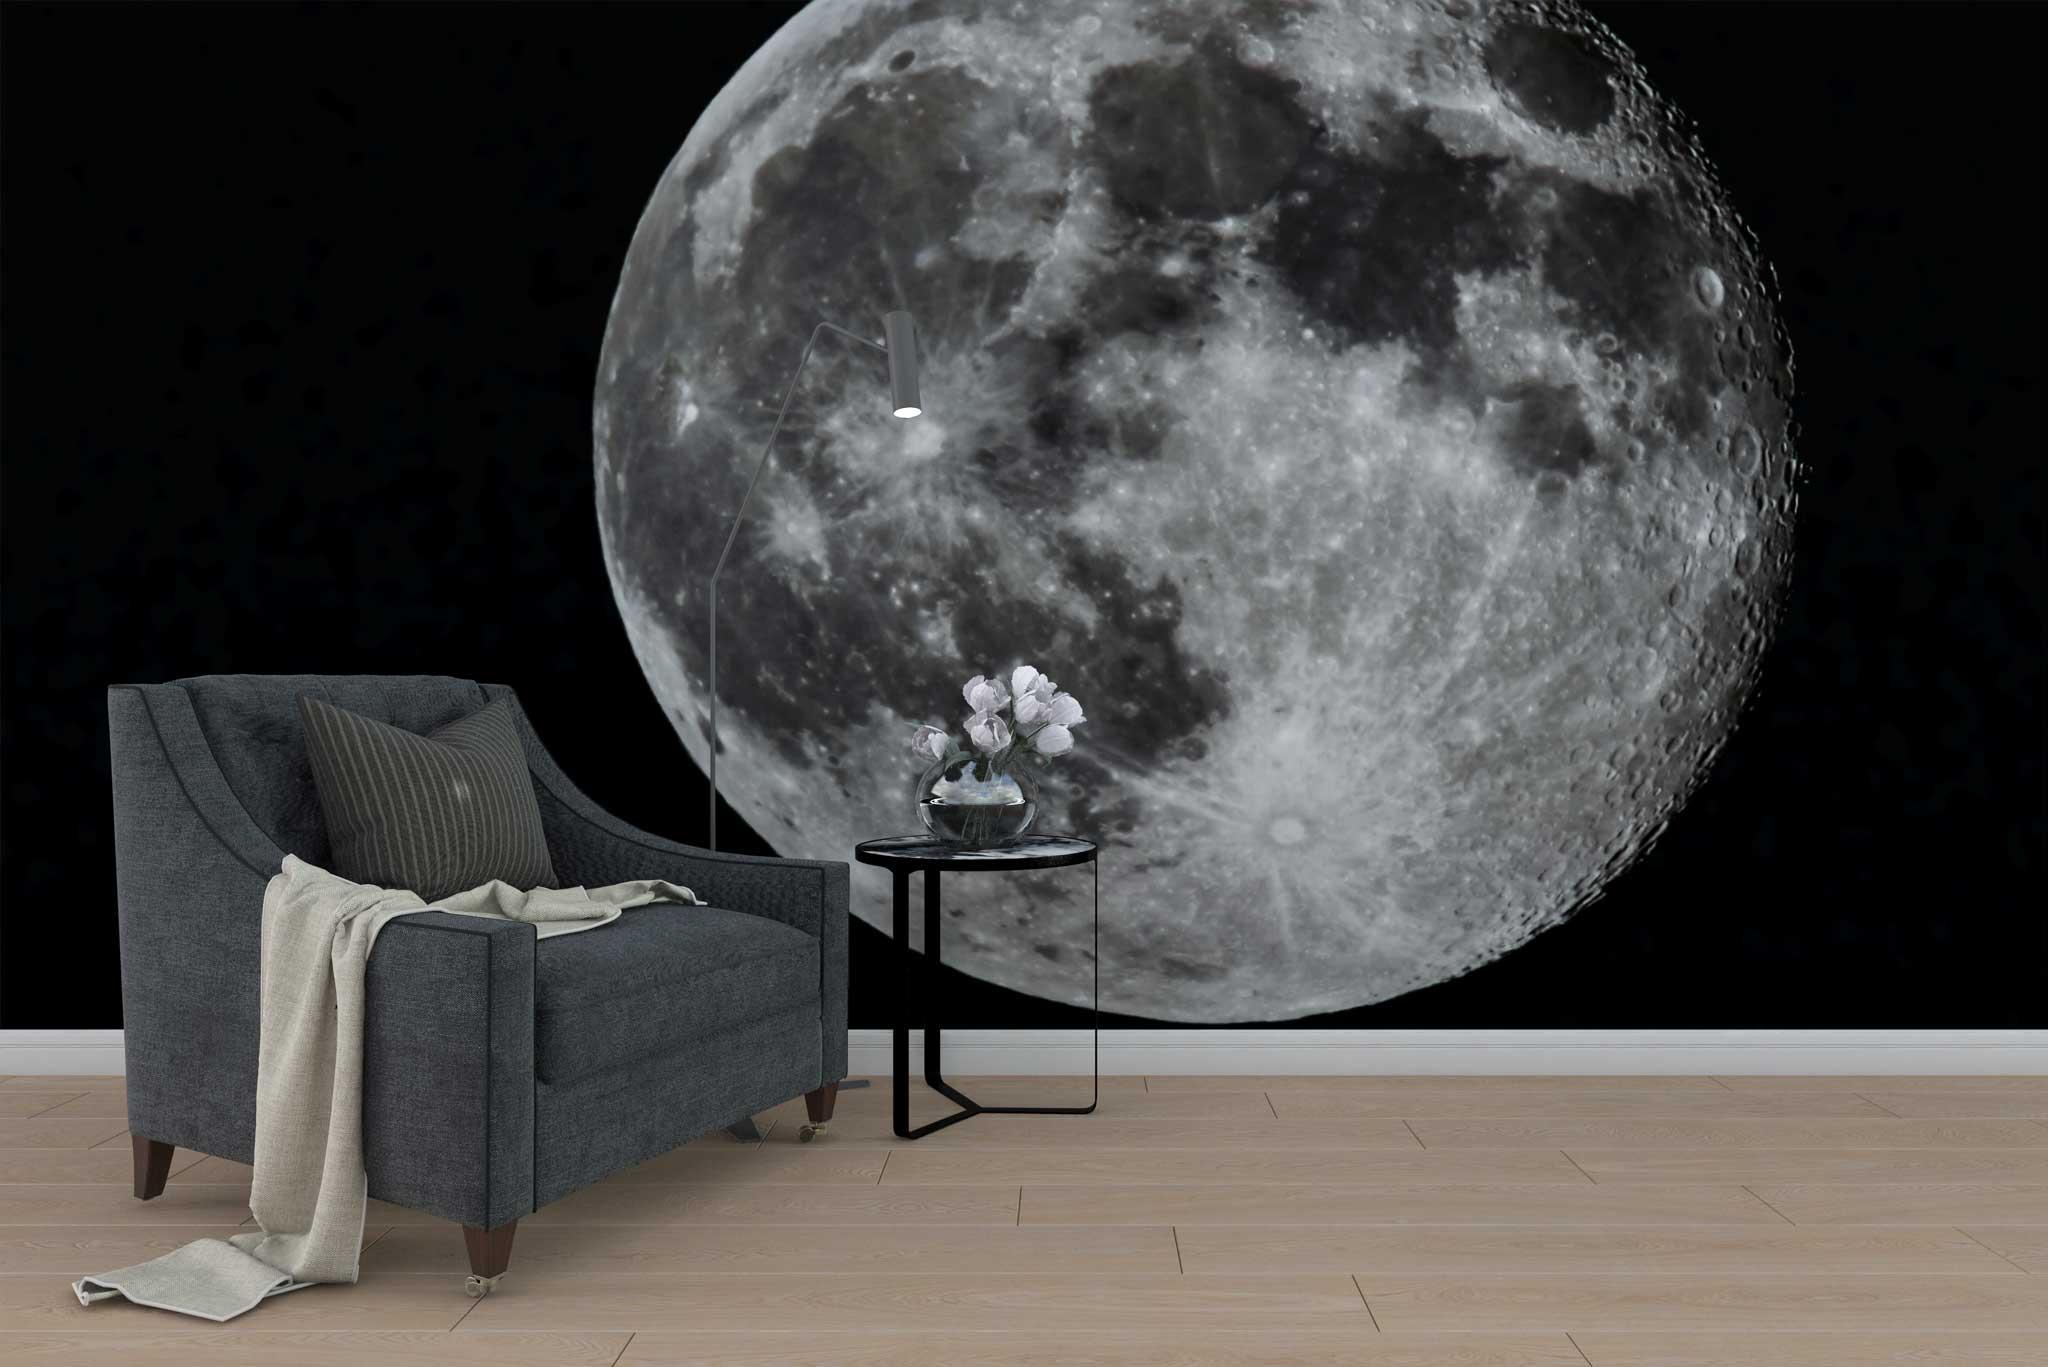 tapet-fototapet-design-personalizat-customizabil-comanda-special-model-luna-cer-negru-noapte